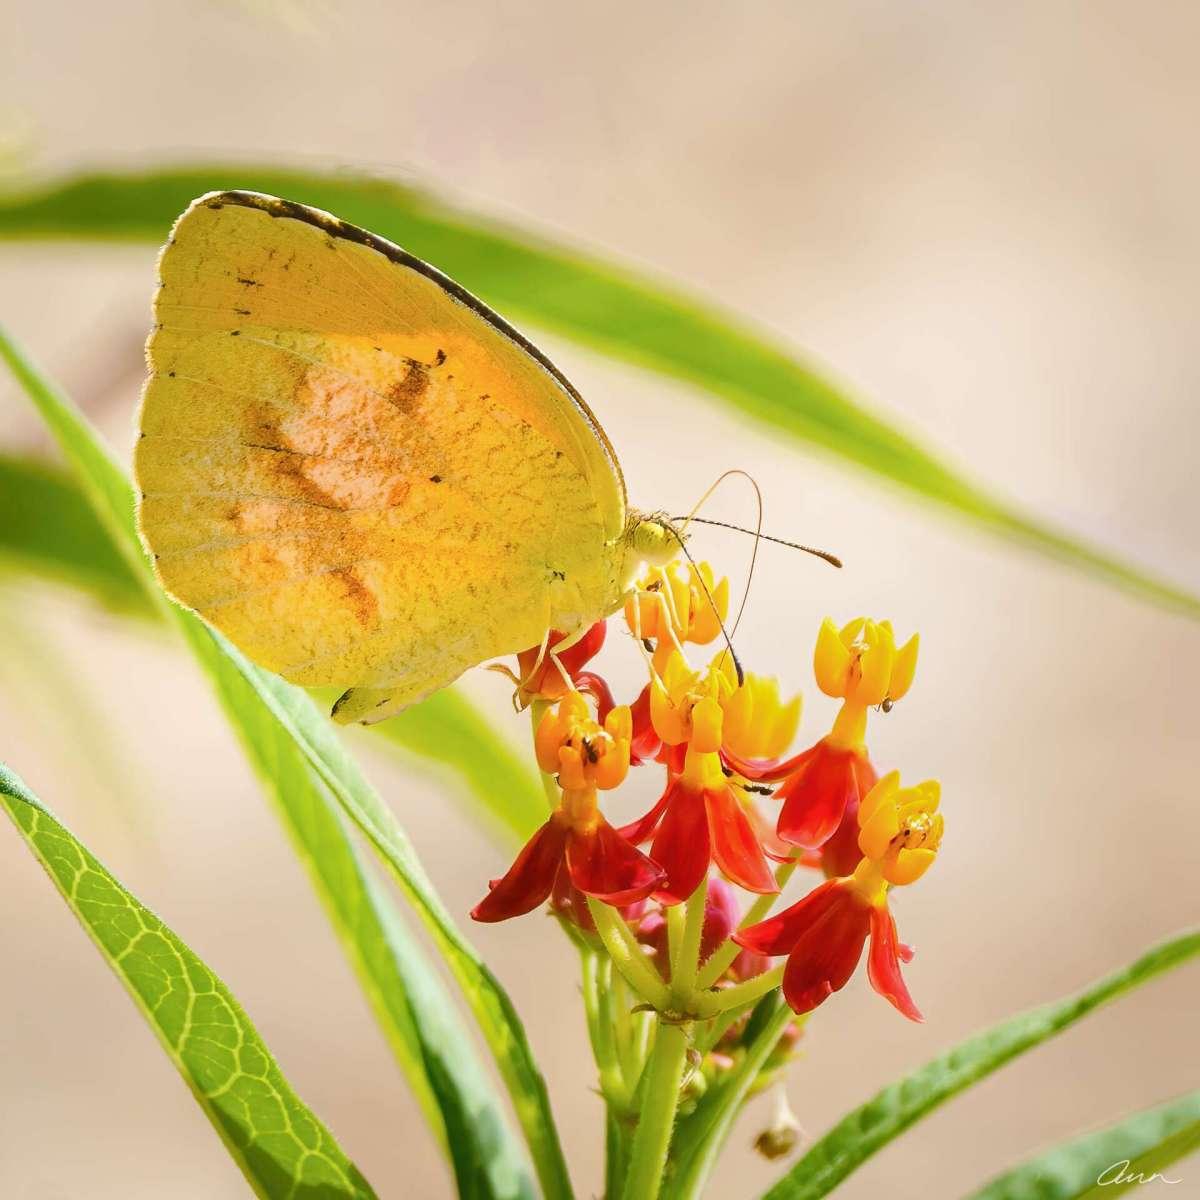 A sleepy orange butterfly takes advantage of milkweed nectar.